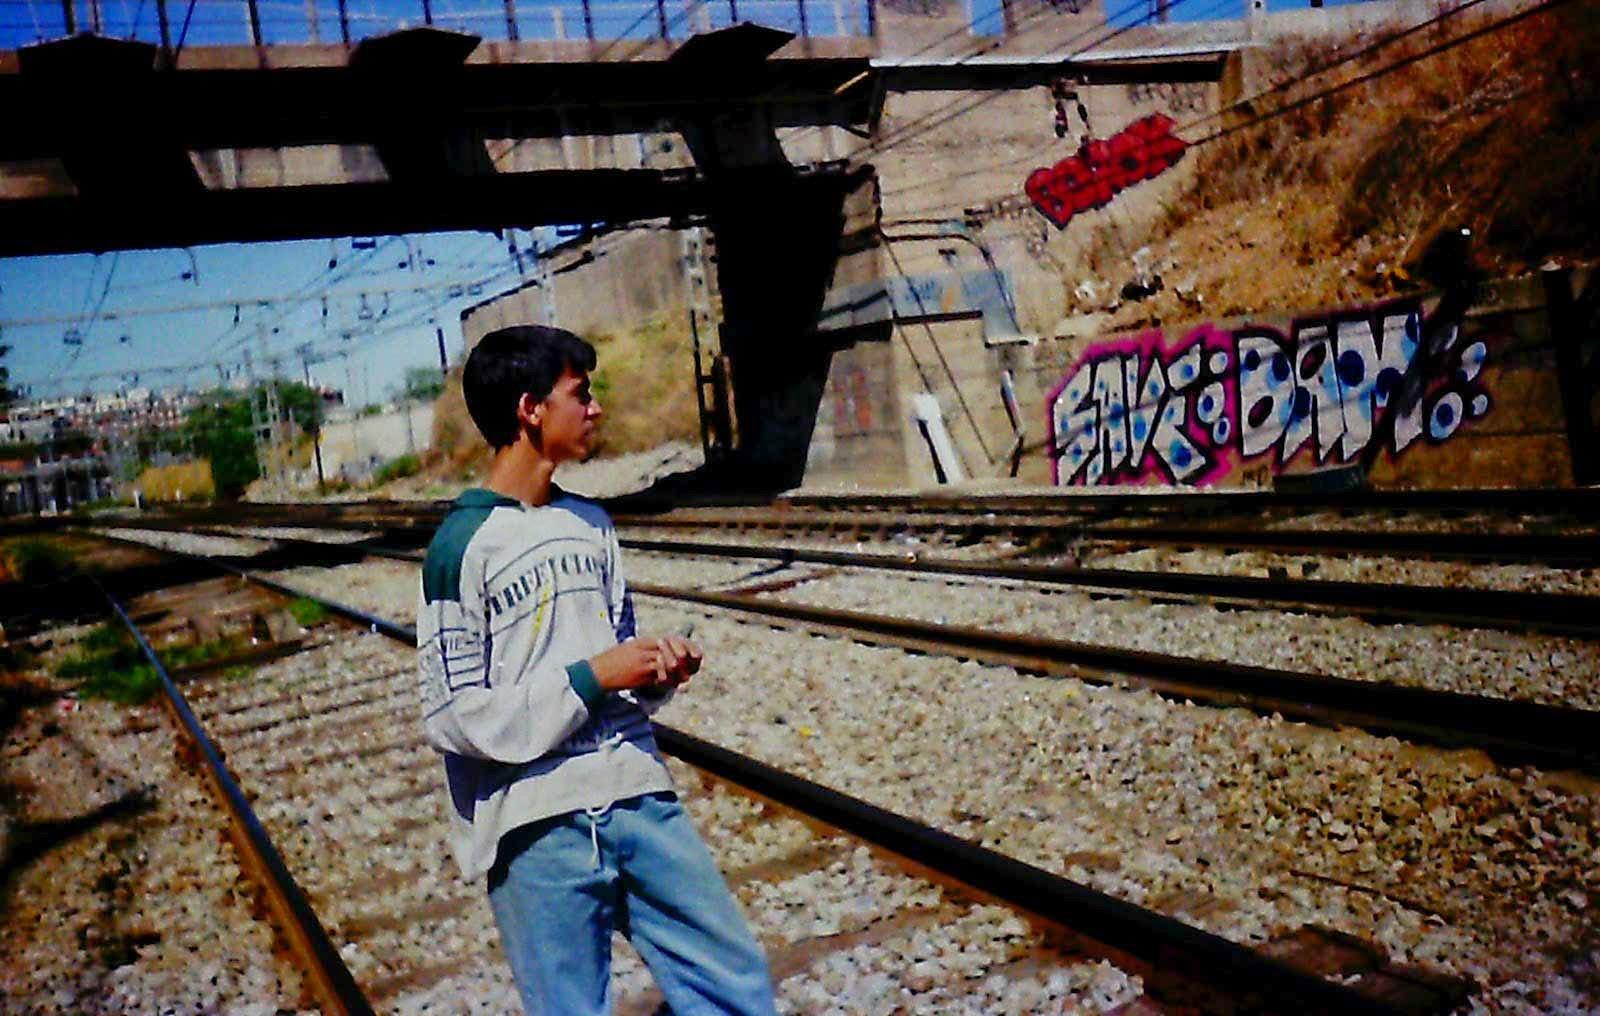 Graffitis con Save Bzk y Dam en las vías de Marina